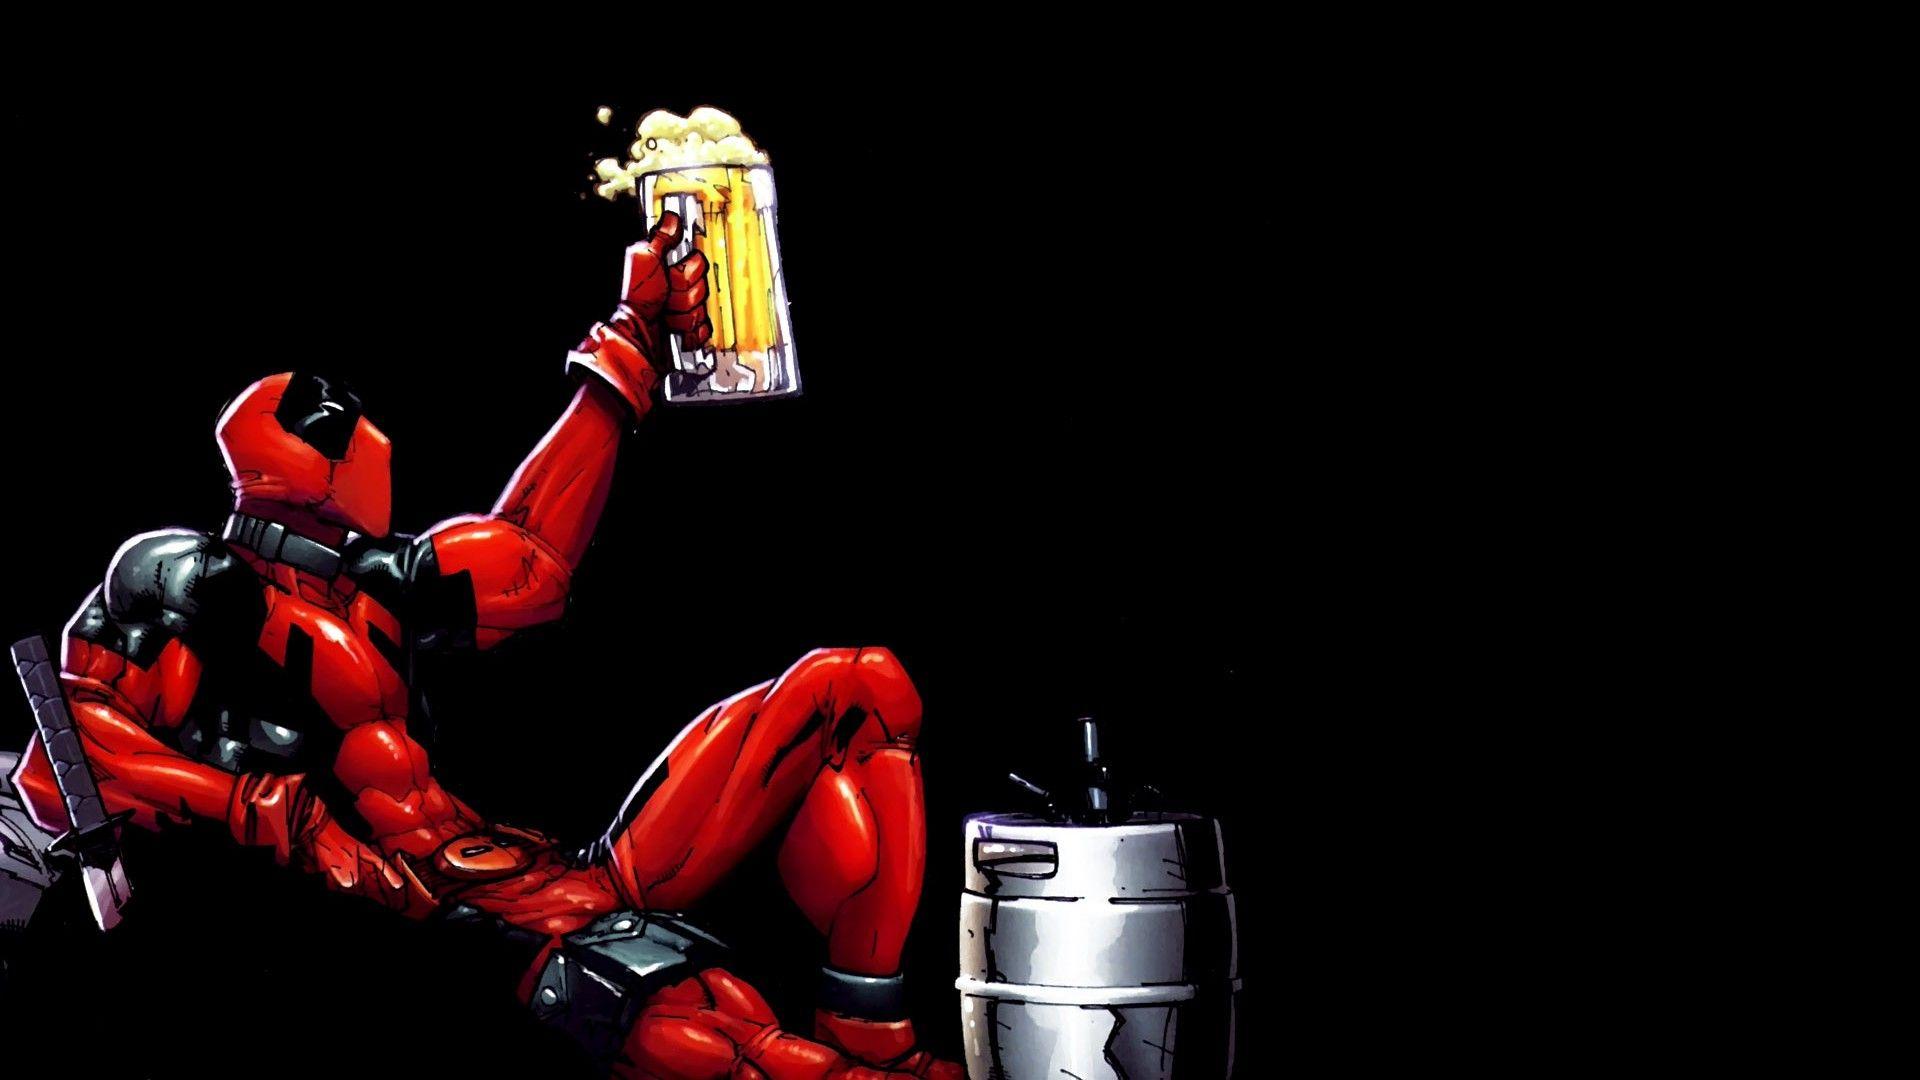 Deadpool Wallpaper 1920x1080 Hd Google Search Marvel Pinterest